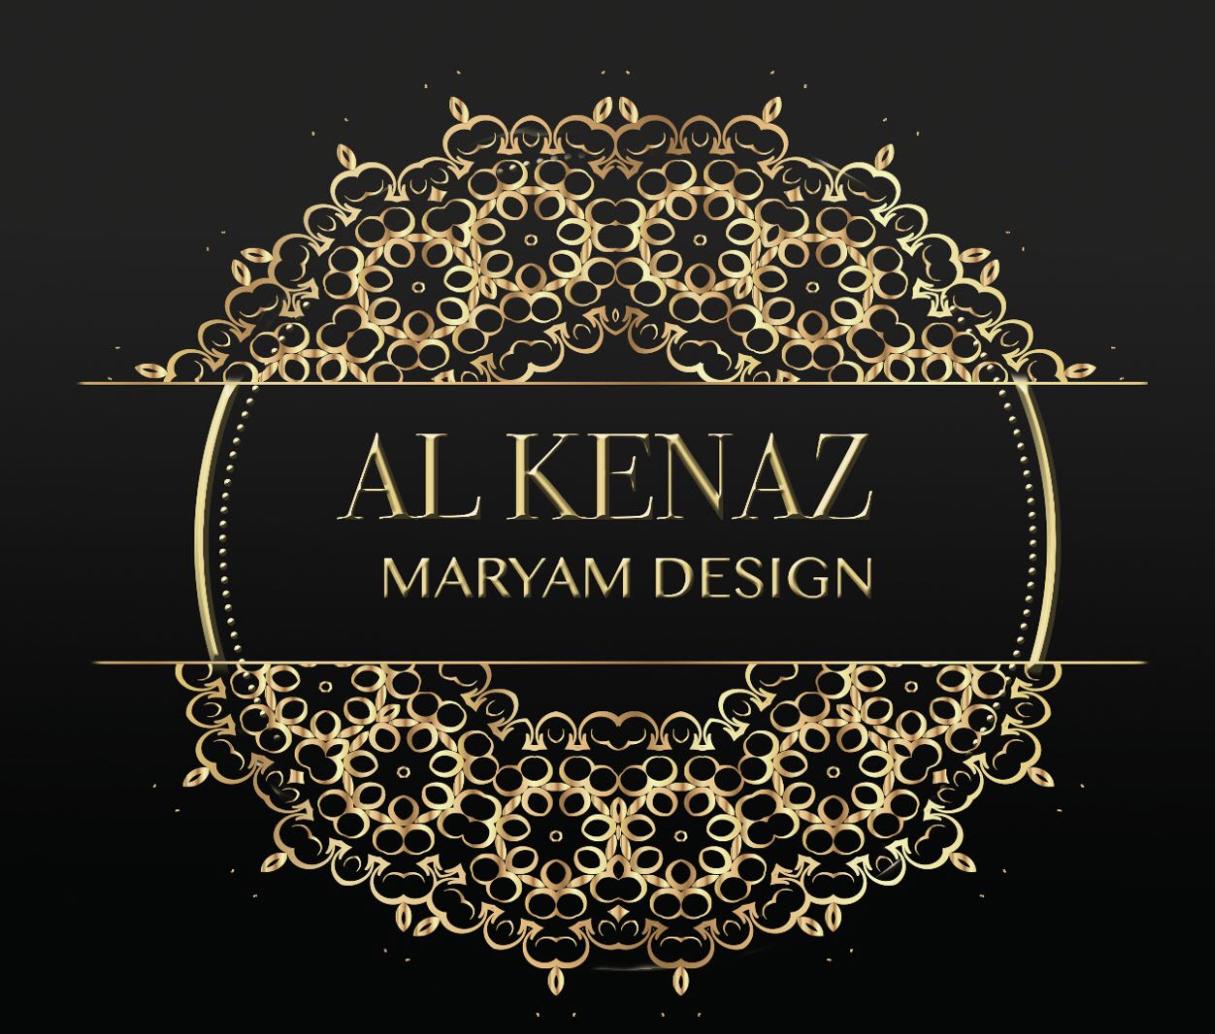 Alkenaz